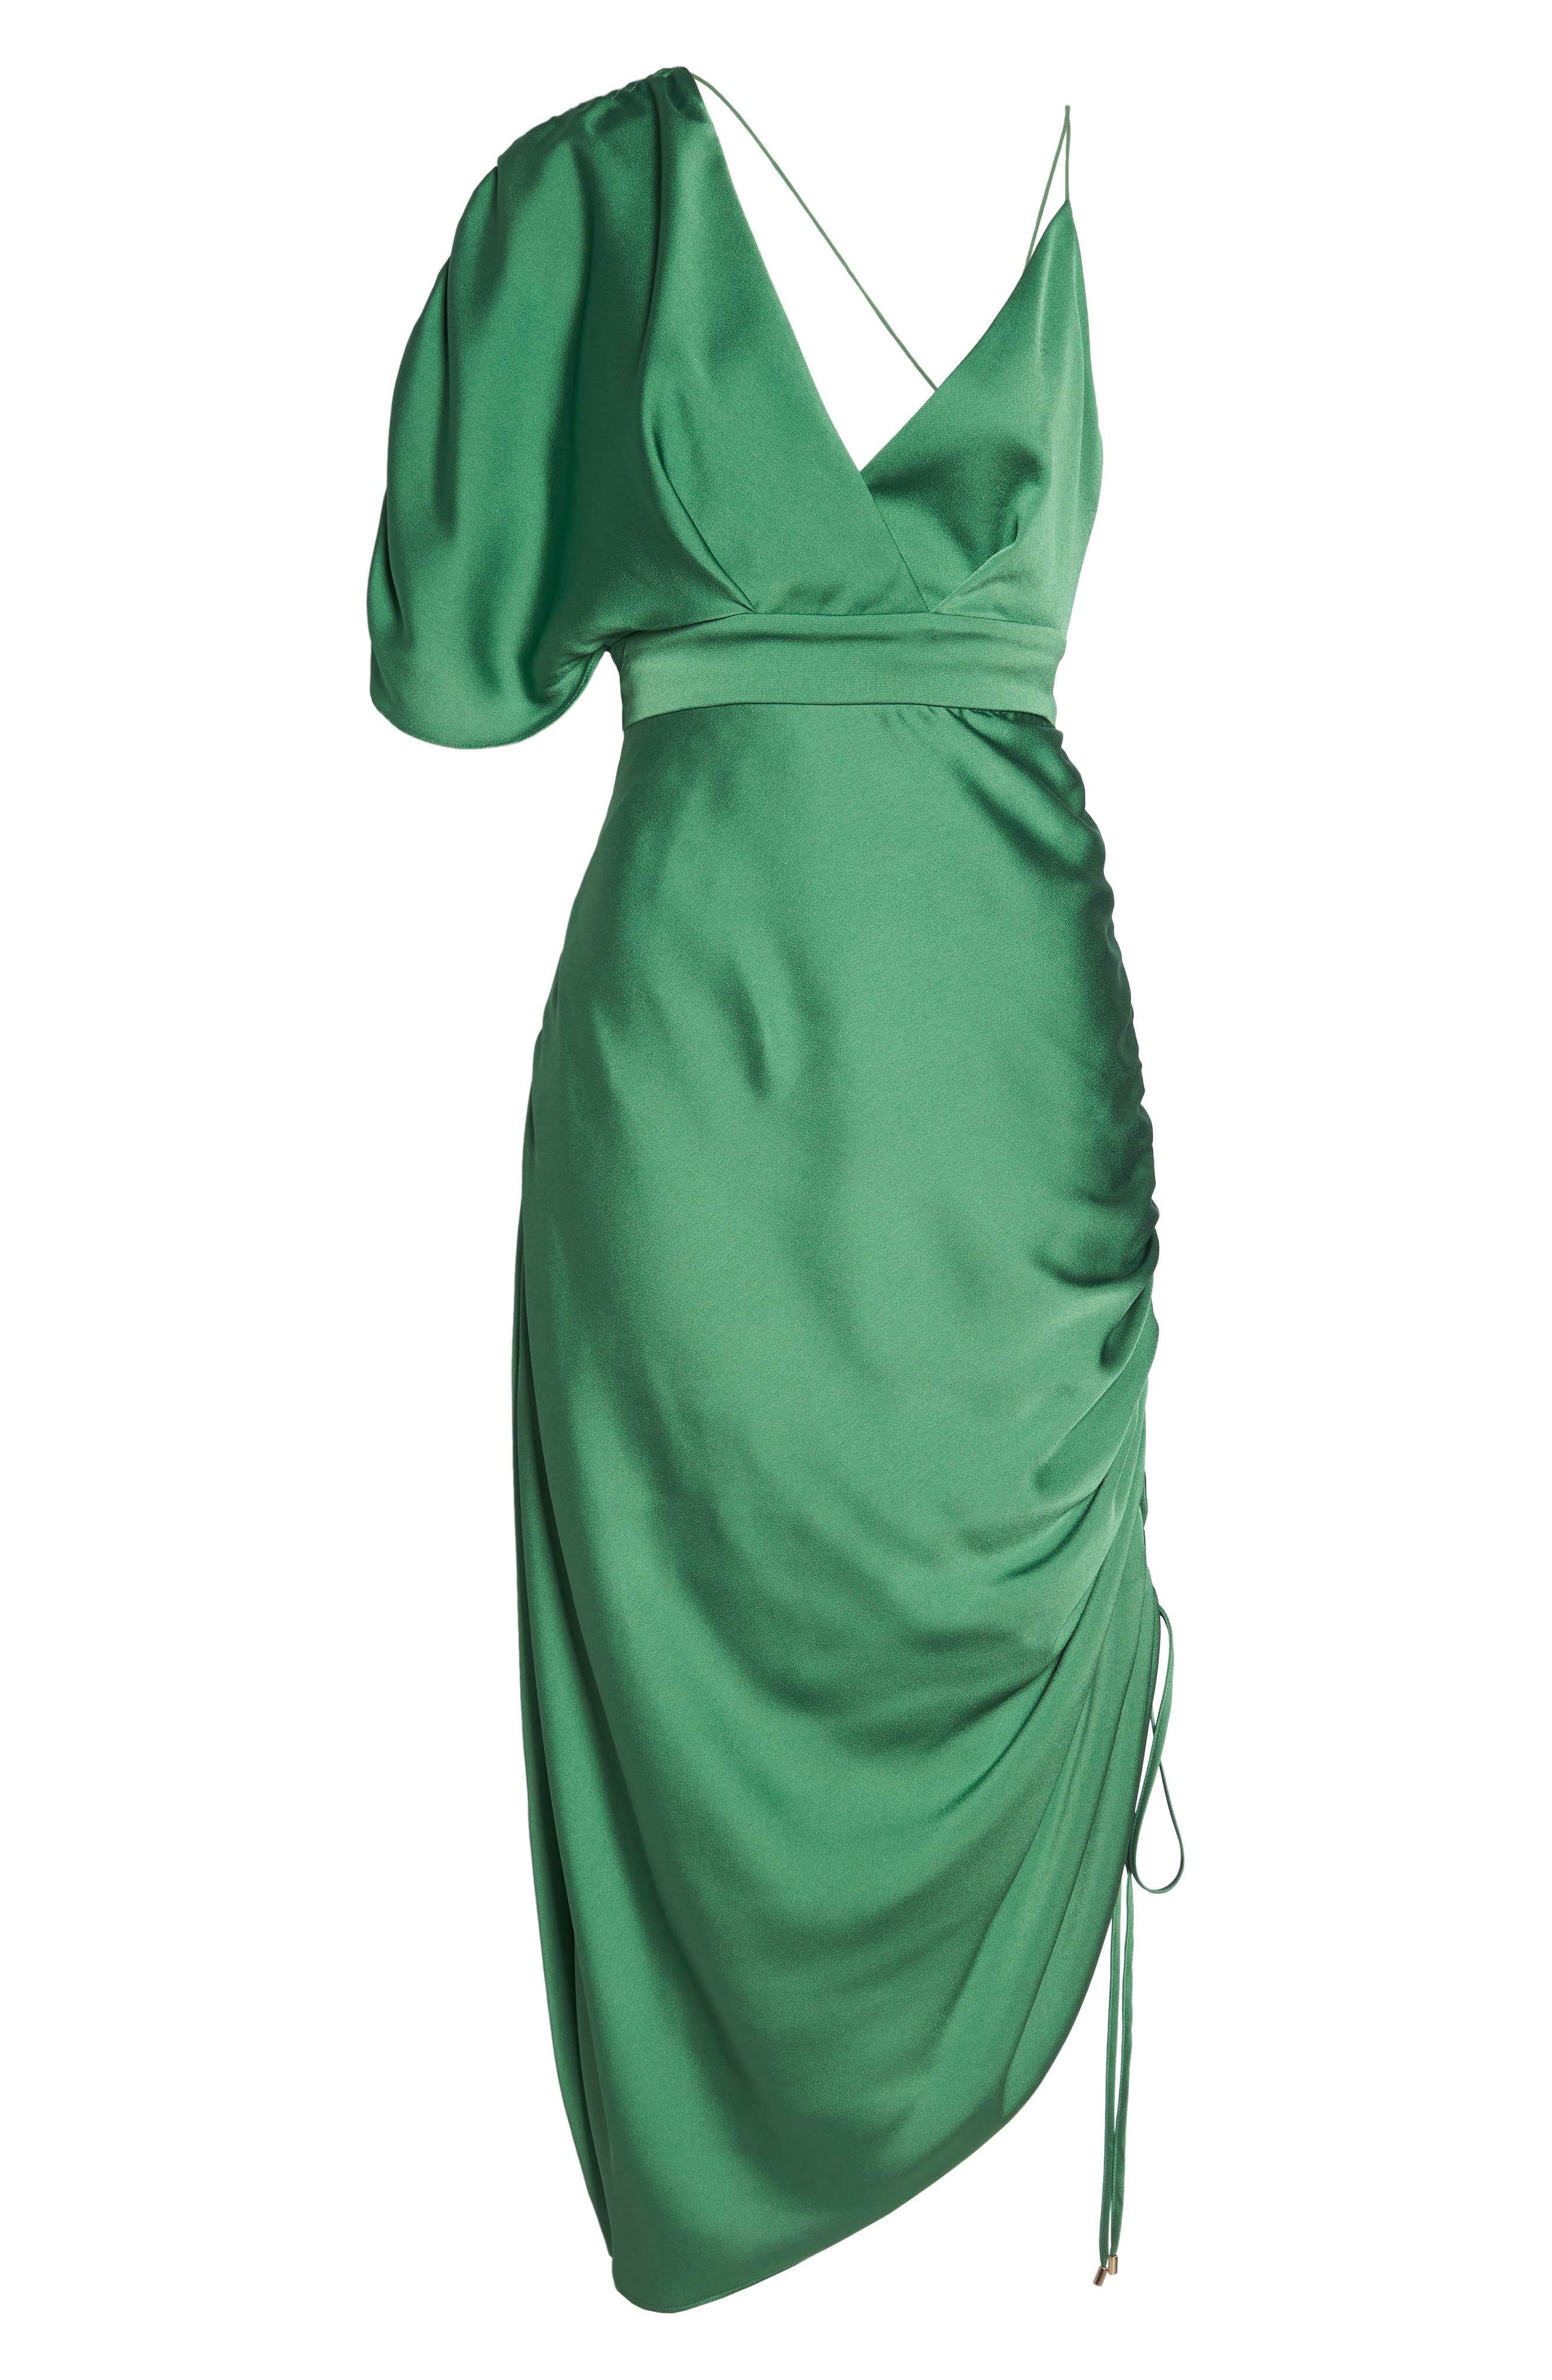 I've Got You Asymmetrical Satin Dress,                             Alternate thumbnail 6, color,                             Emerald Green